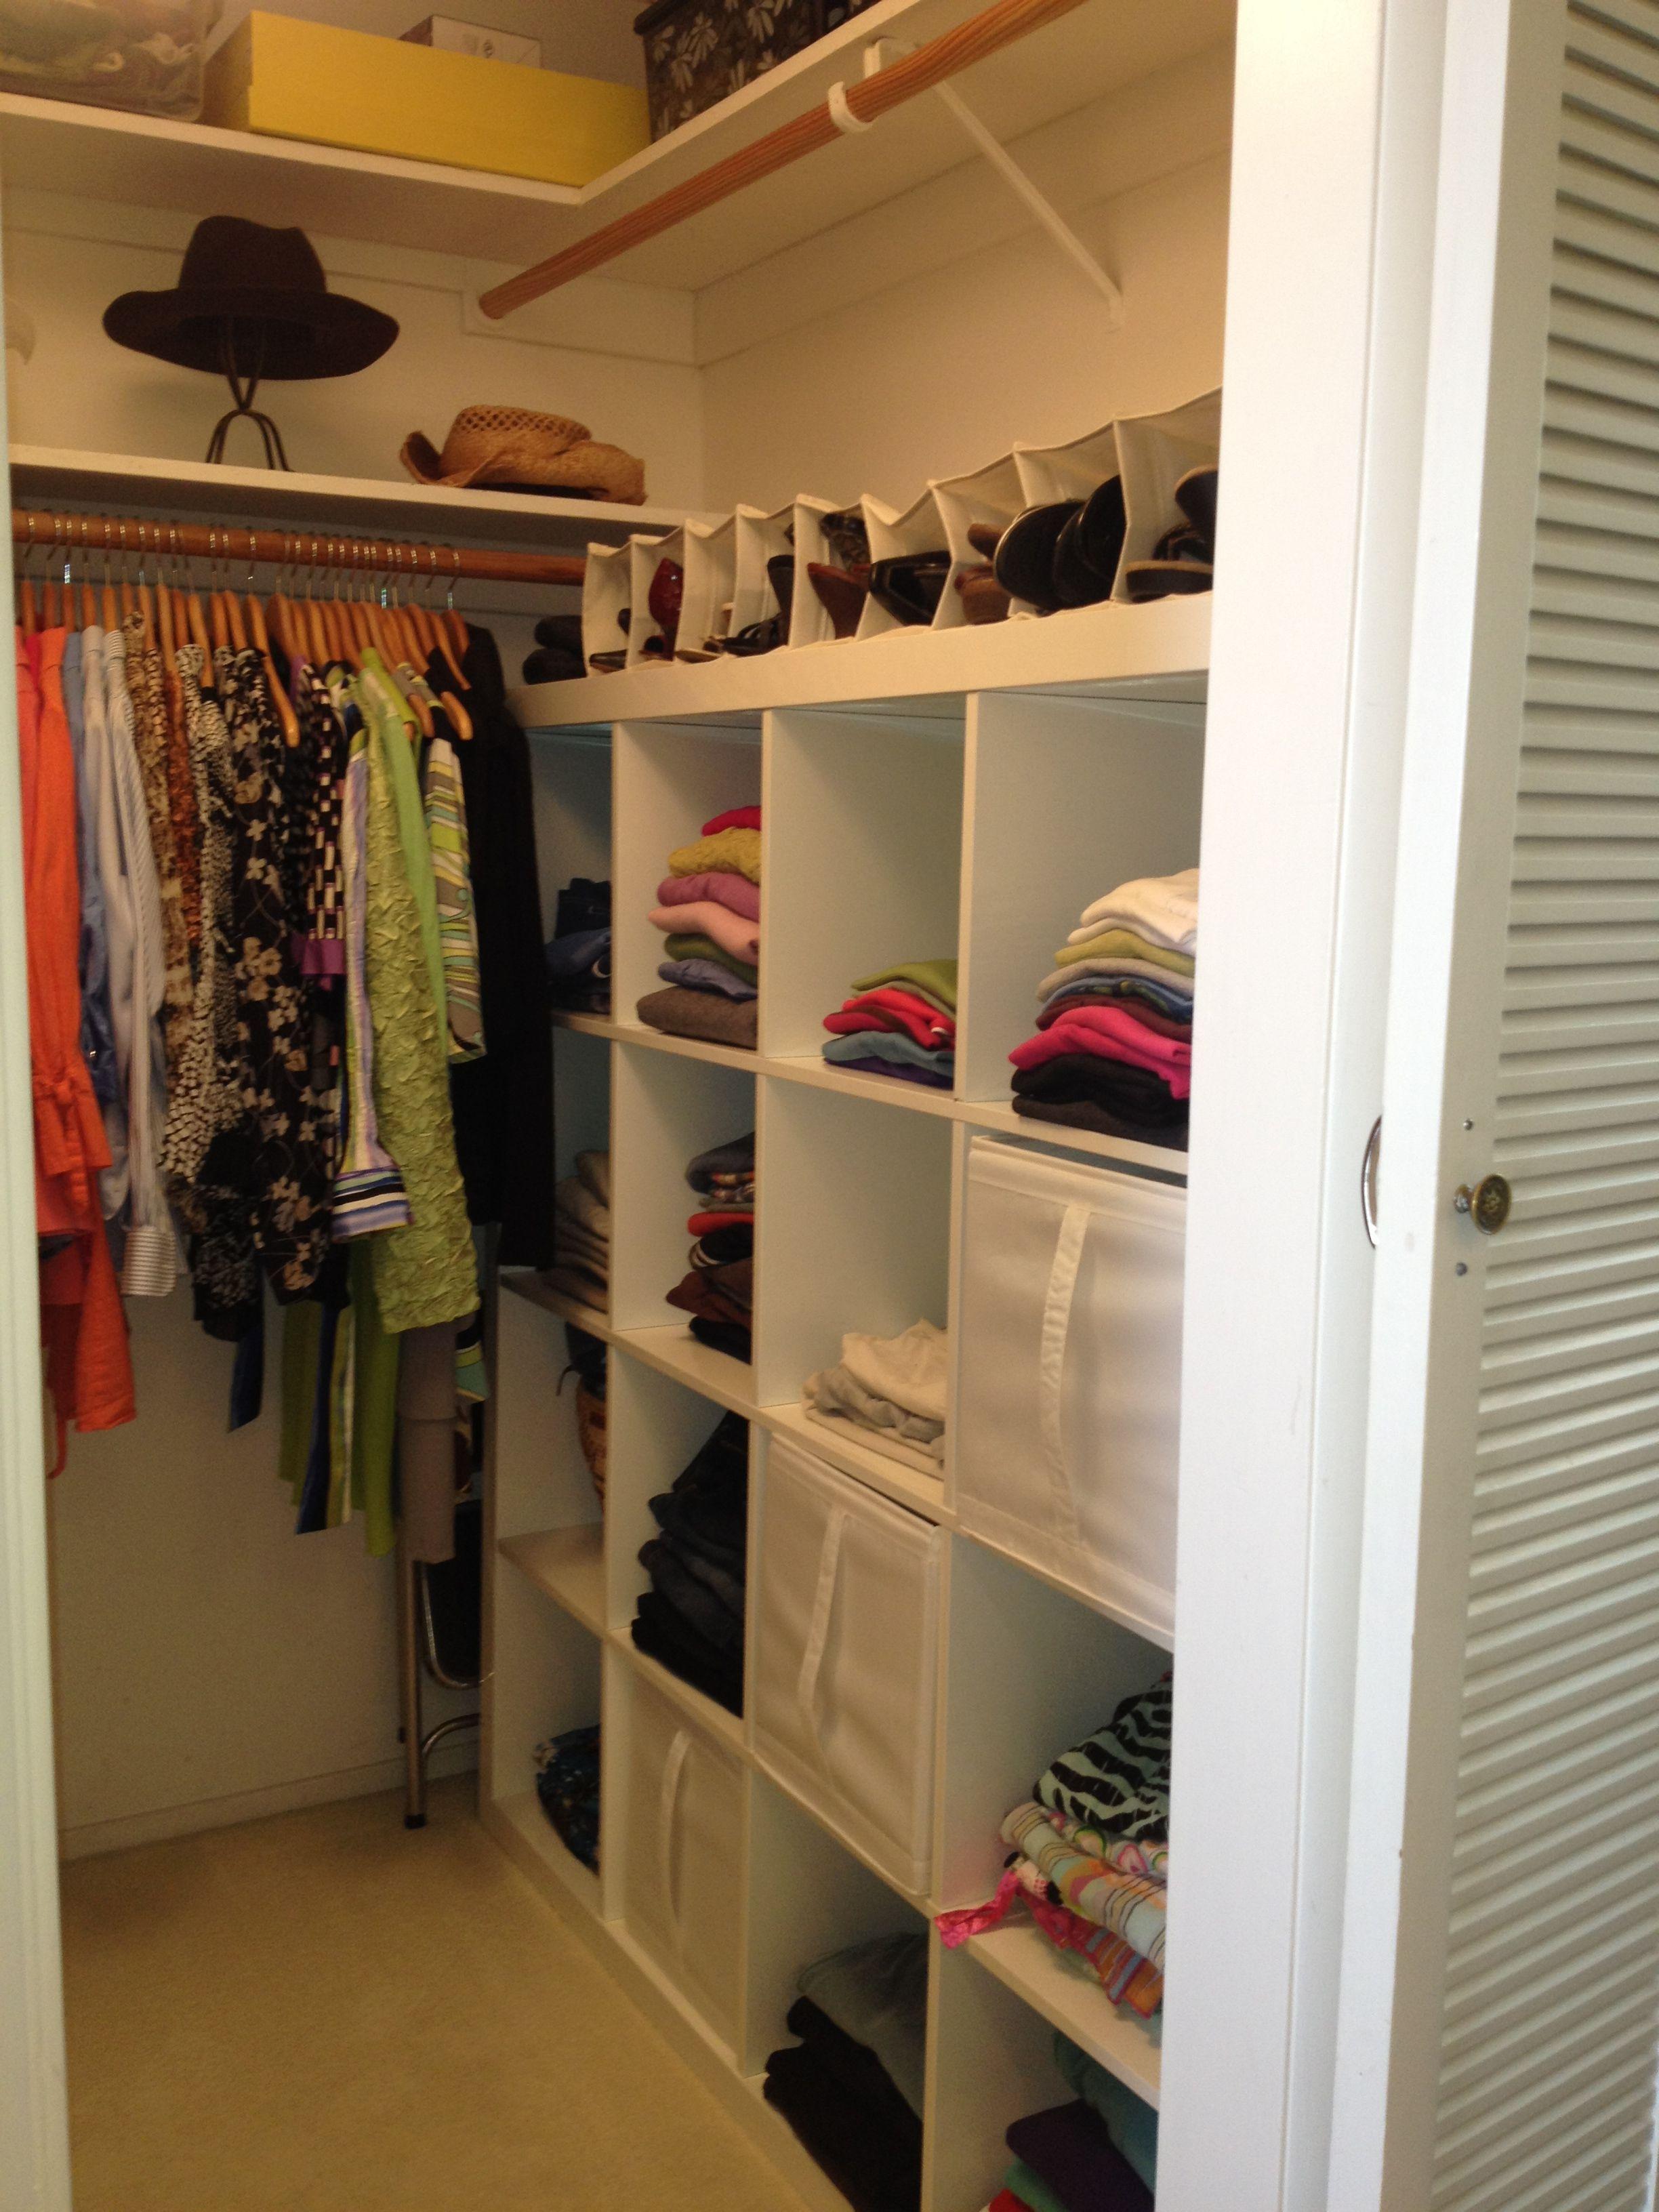 Compact Wardrobe Storage 12 Small Walk In Closet Ideas And Organizer Designs Compactwardrobe